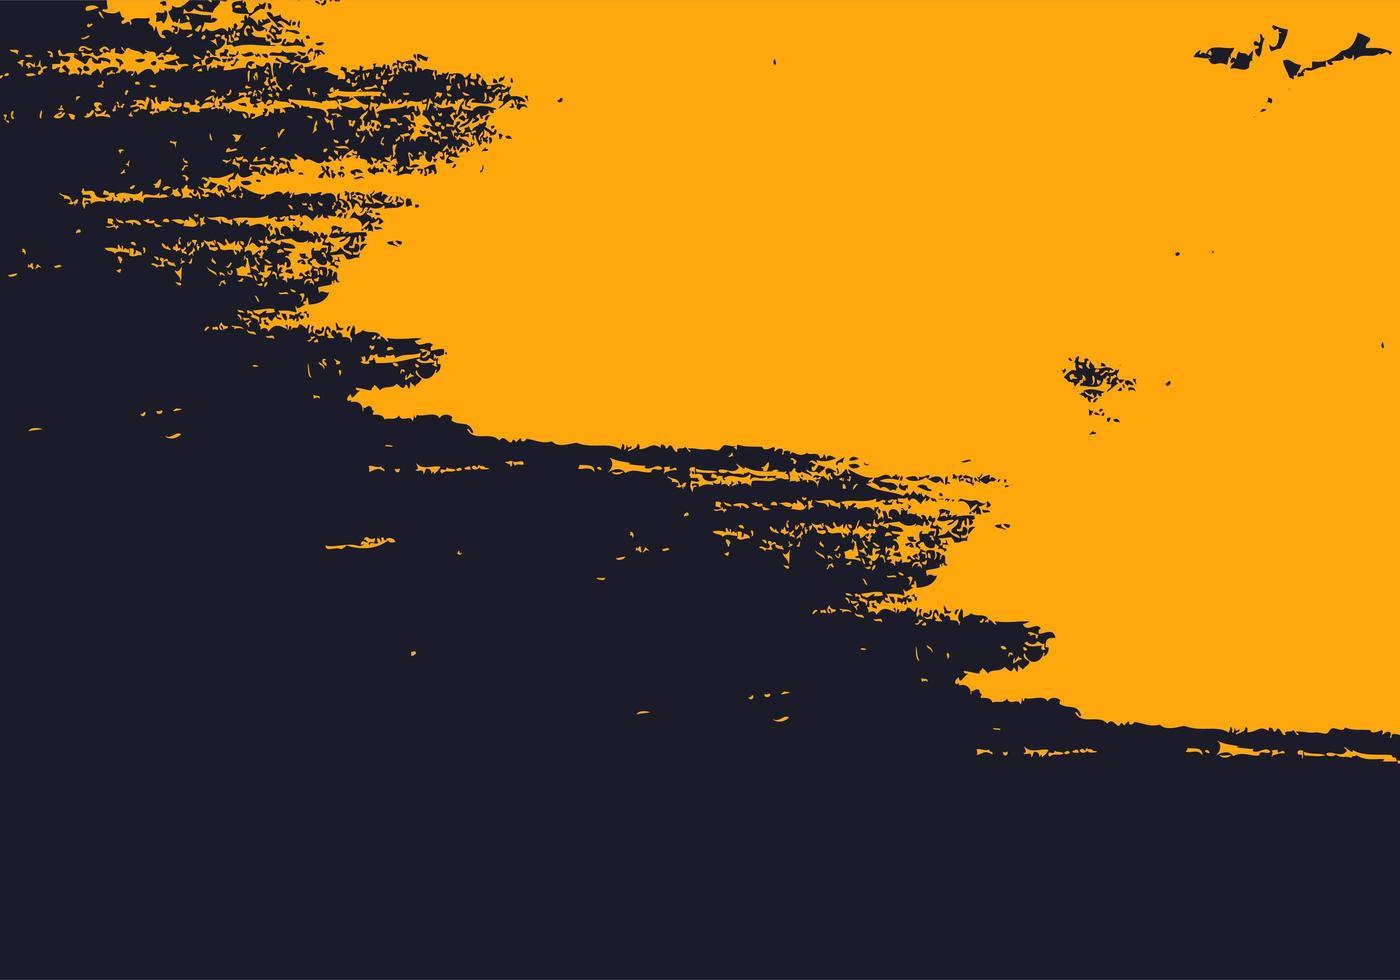 texture de peinture abstraite grunge jaune et marine vecteur